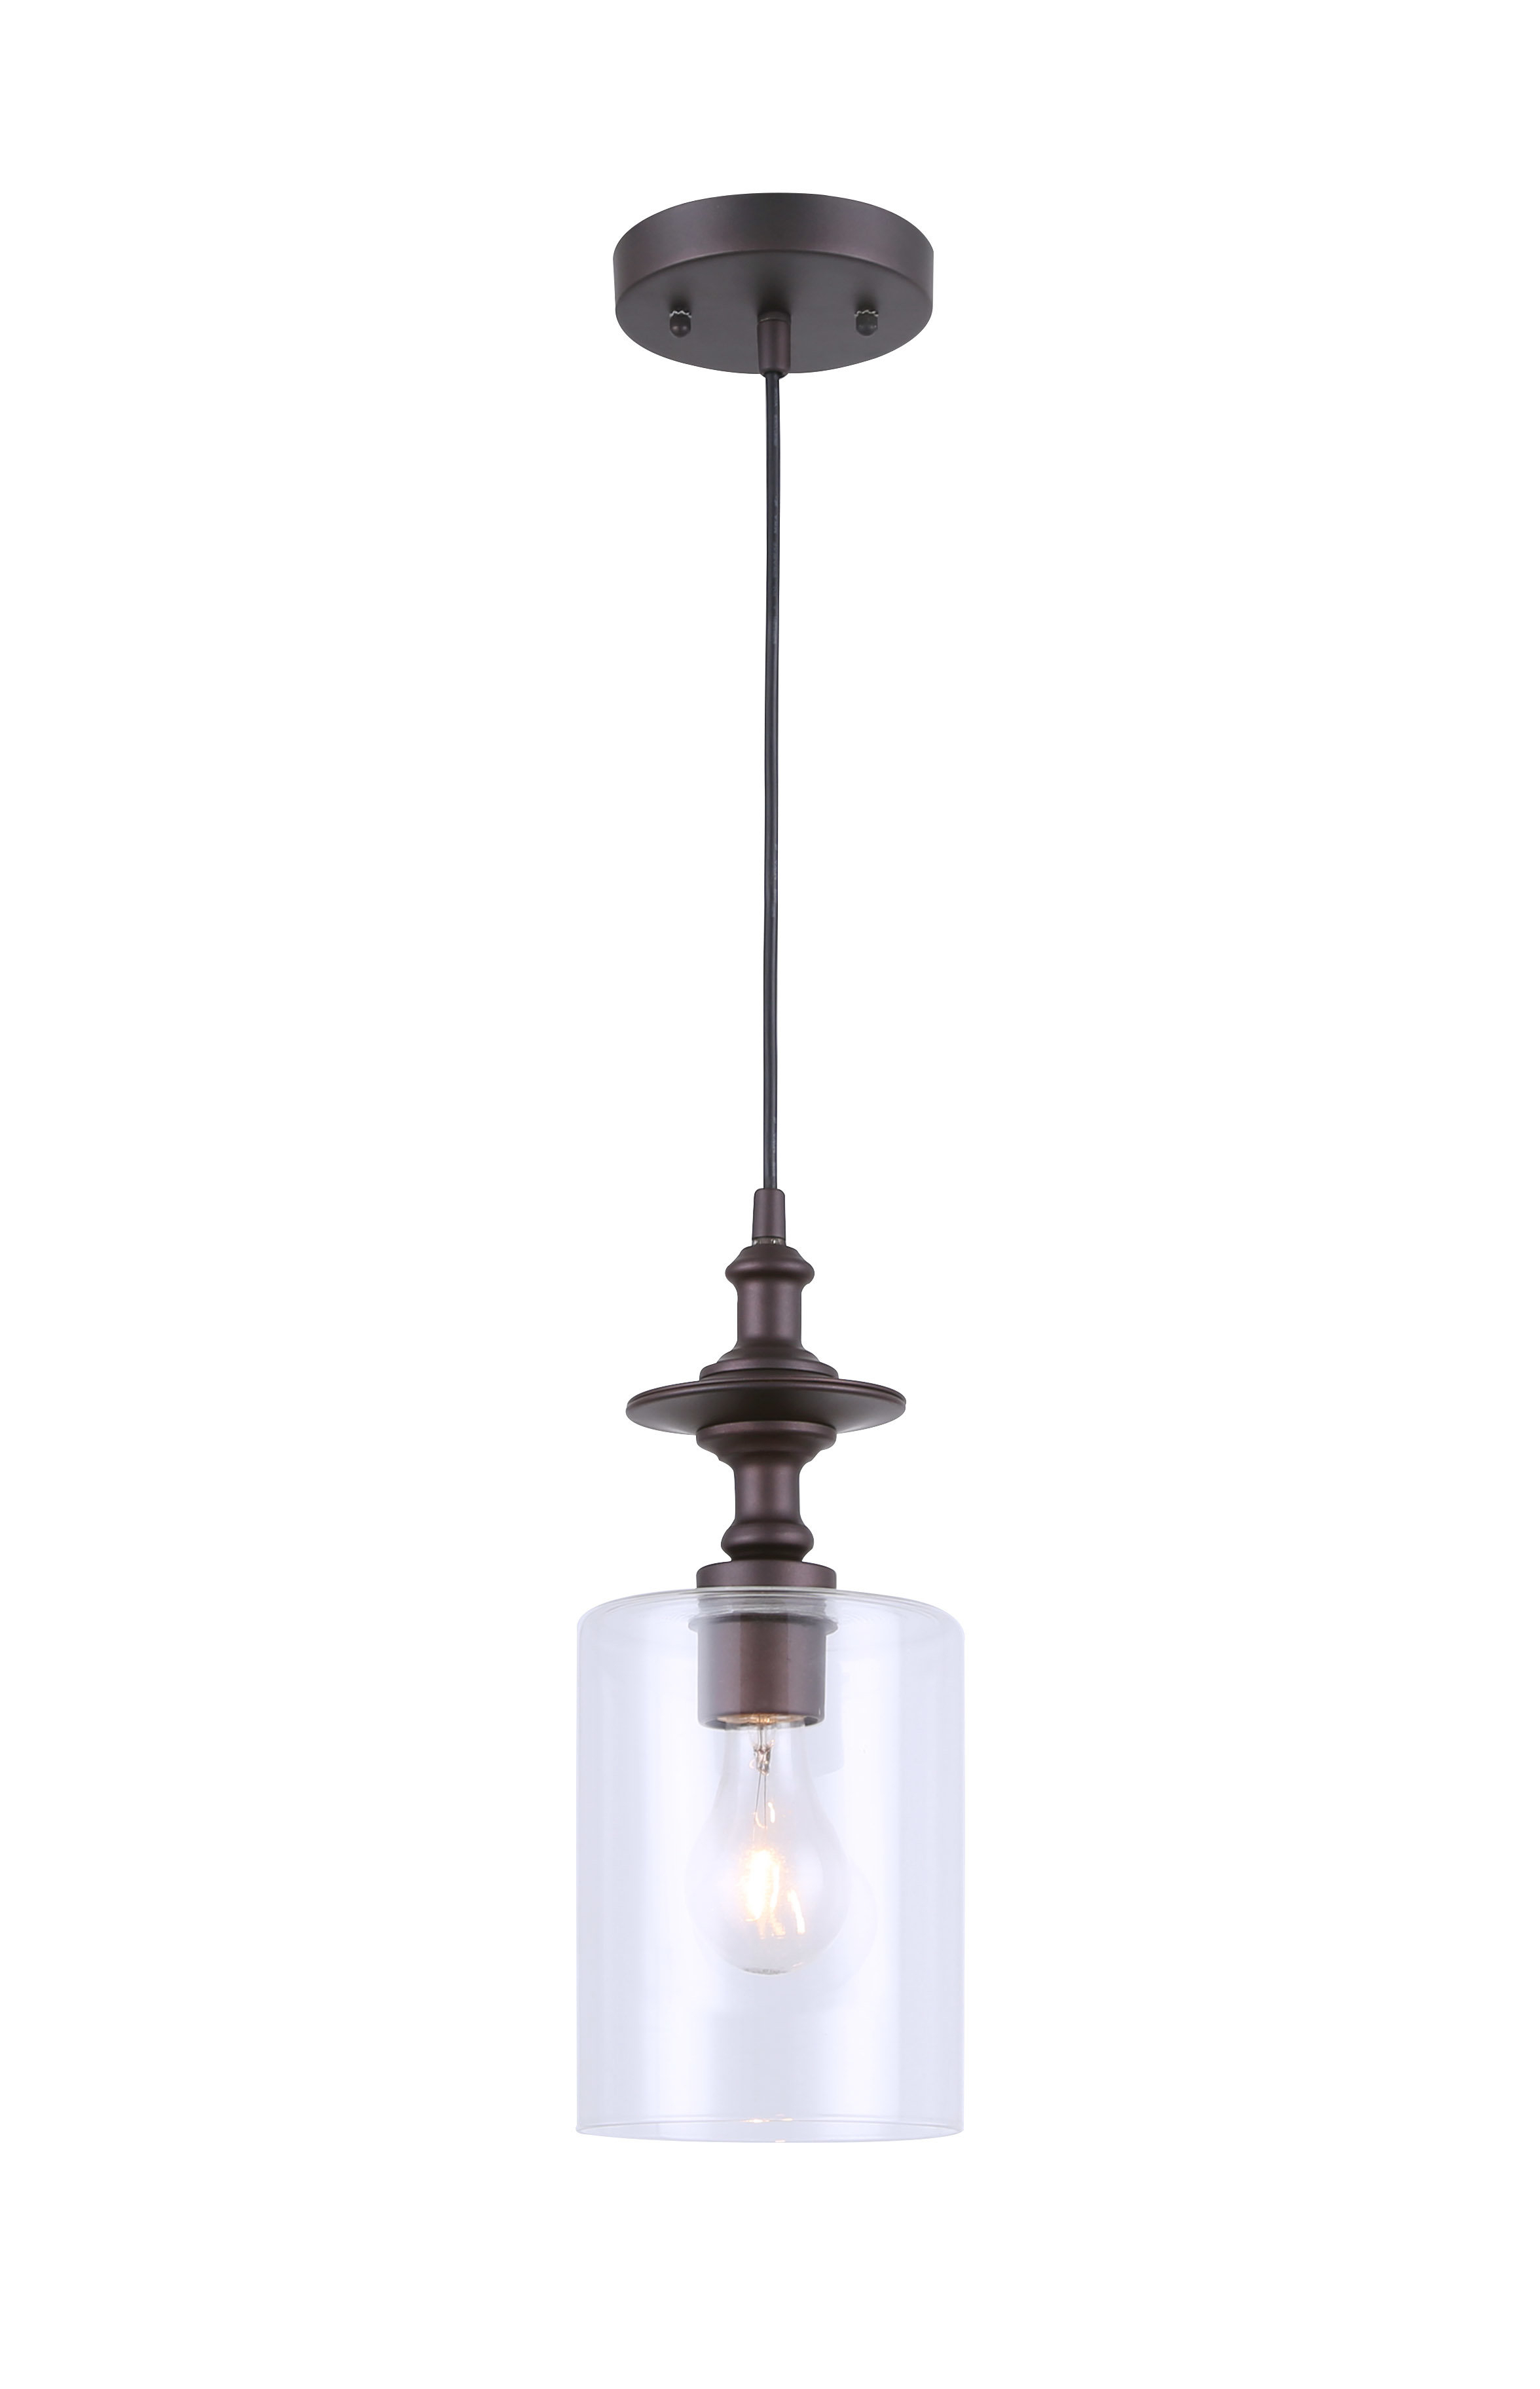 Popular Wadlington 6 Light Single Cylinder Pendants Throughout Cylinder Pendant Lighting (Gallery 17 of 20)